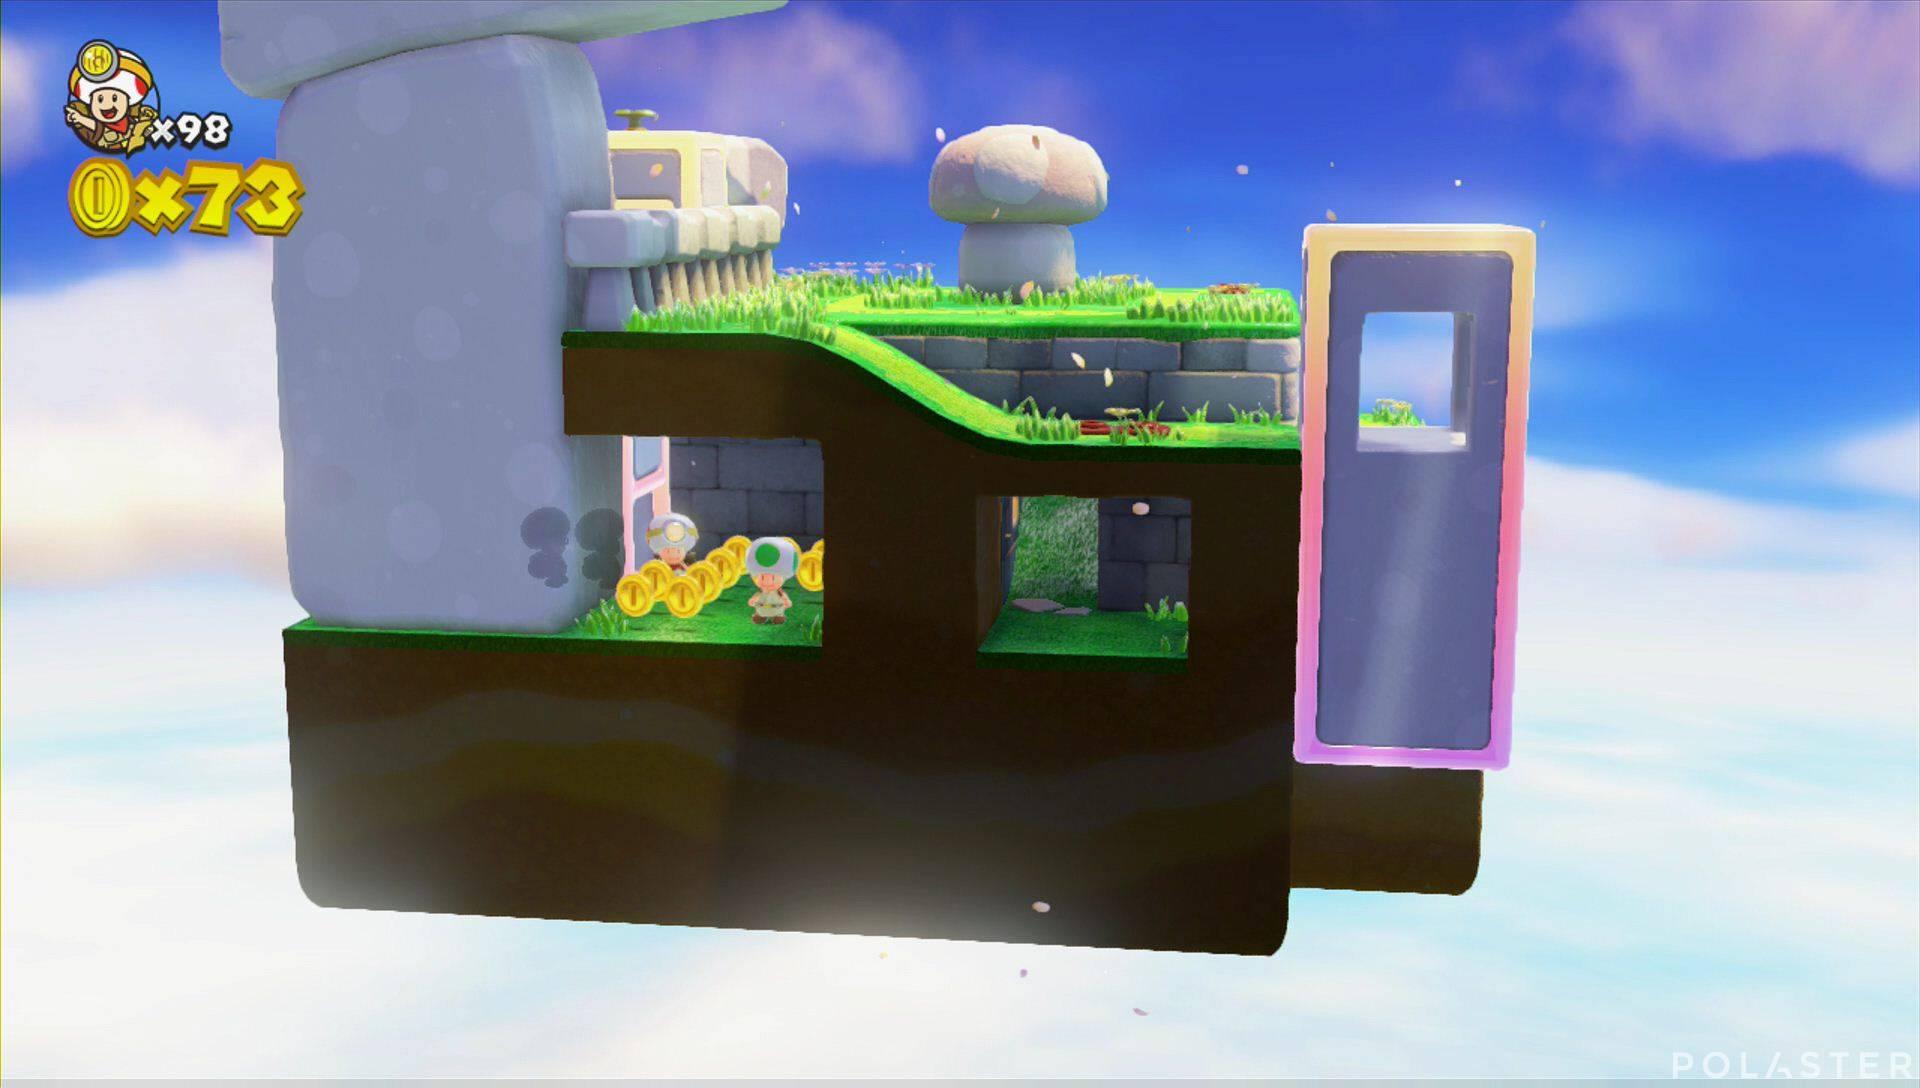 Captain Toad: Treasure Tracker Extra ¡Cuadrilla, a la meseta! Toad verde